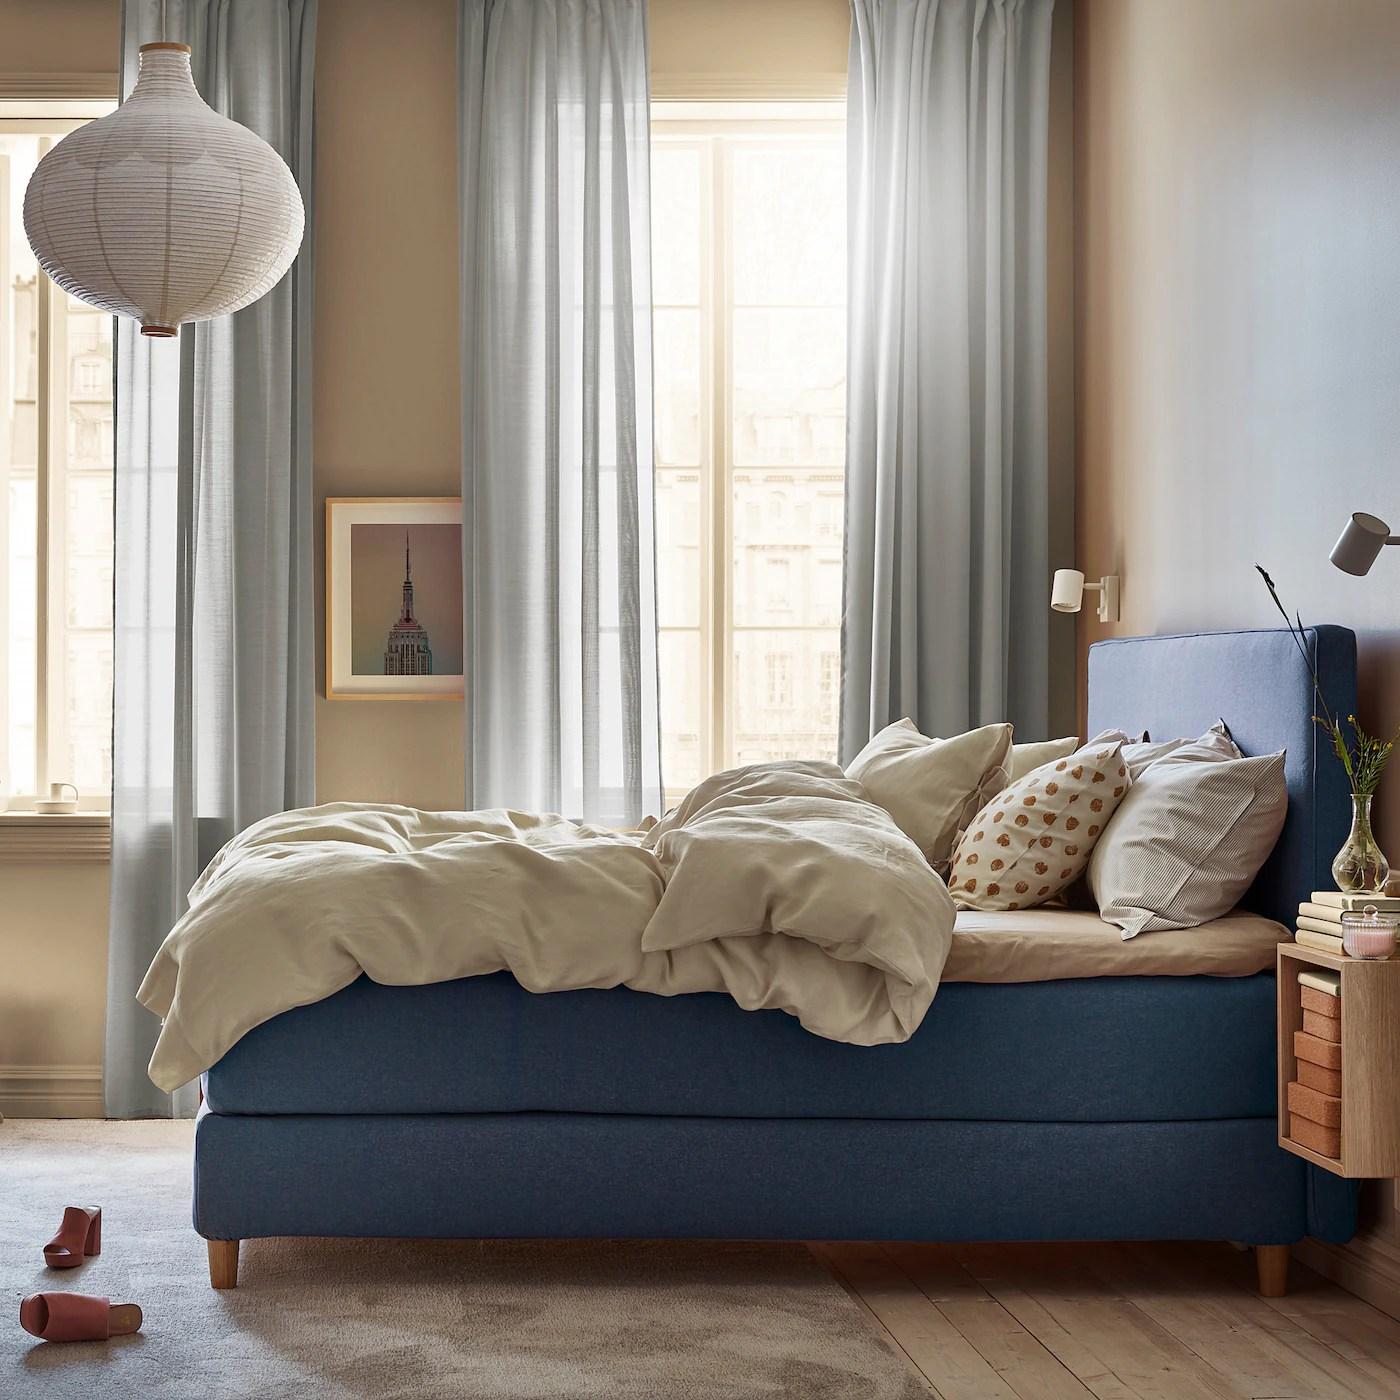 Dunvik Housse Lit Sommier Gunnared Bleu 160x200 Cm Ikea Suisse